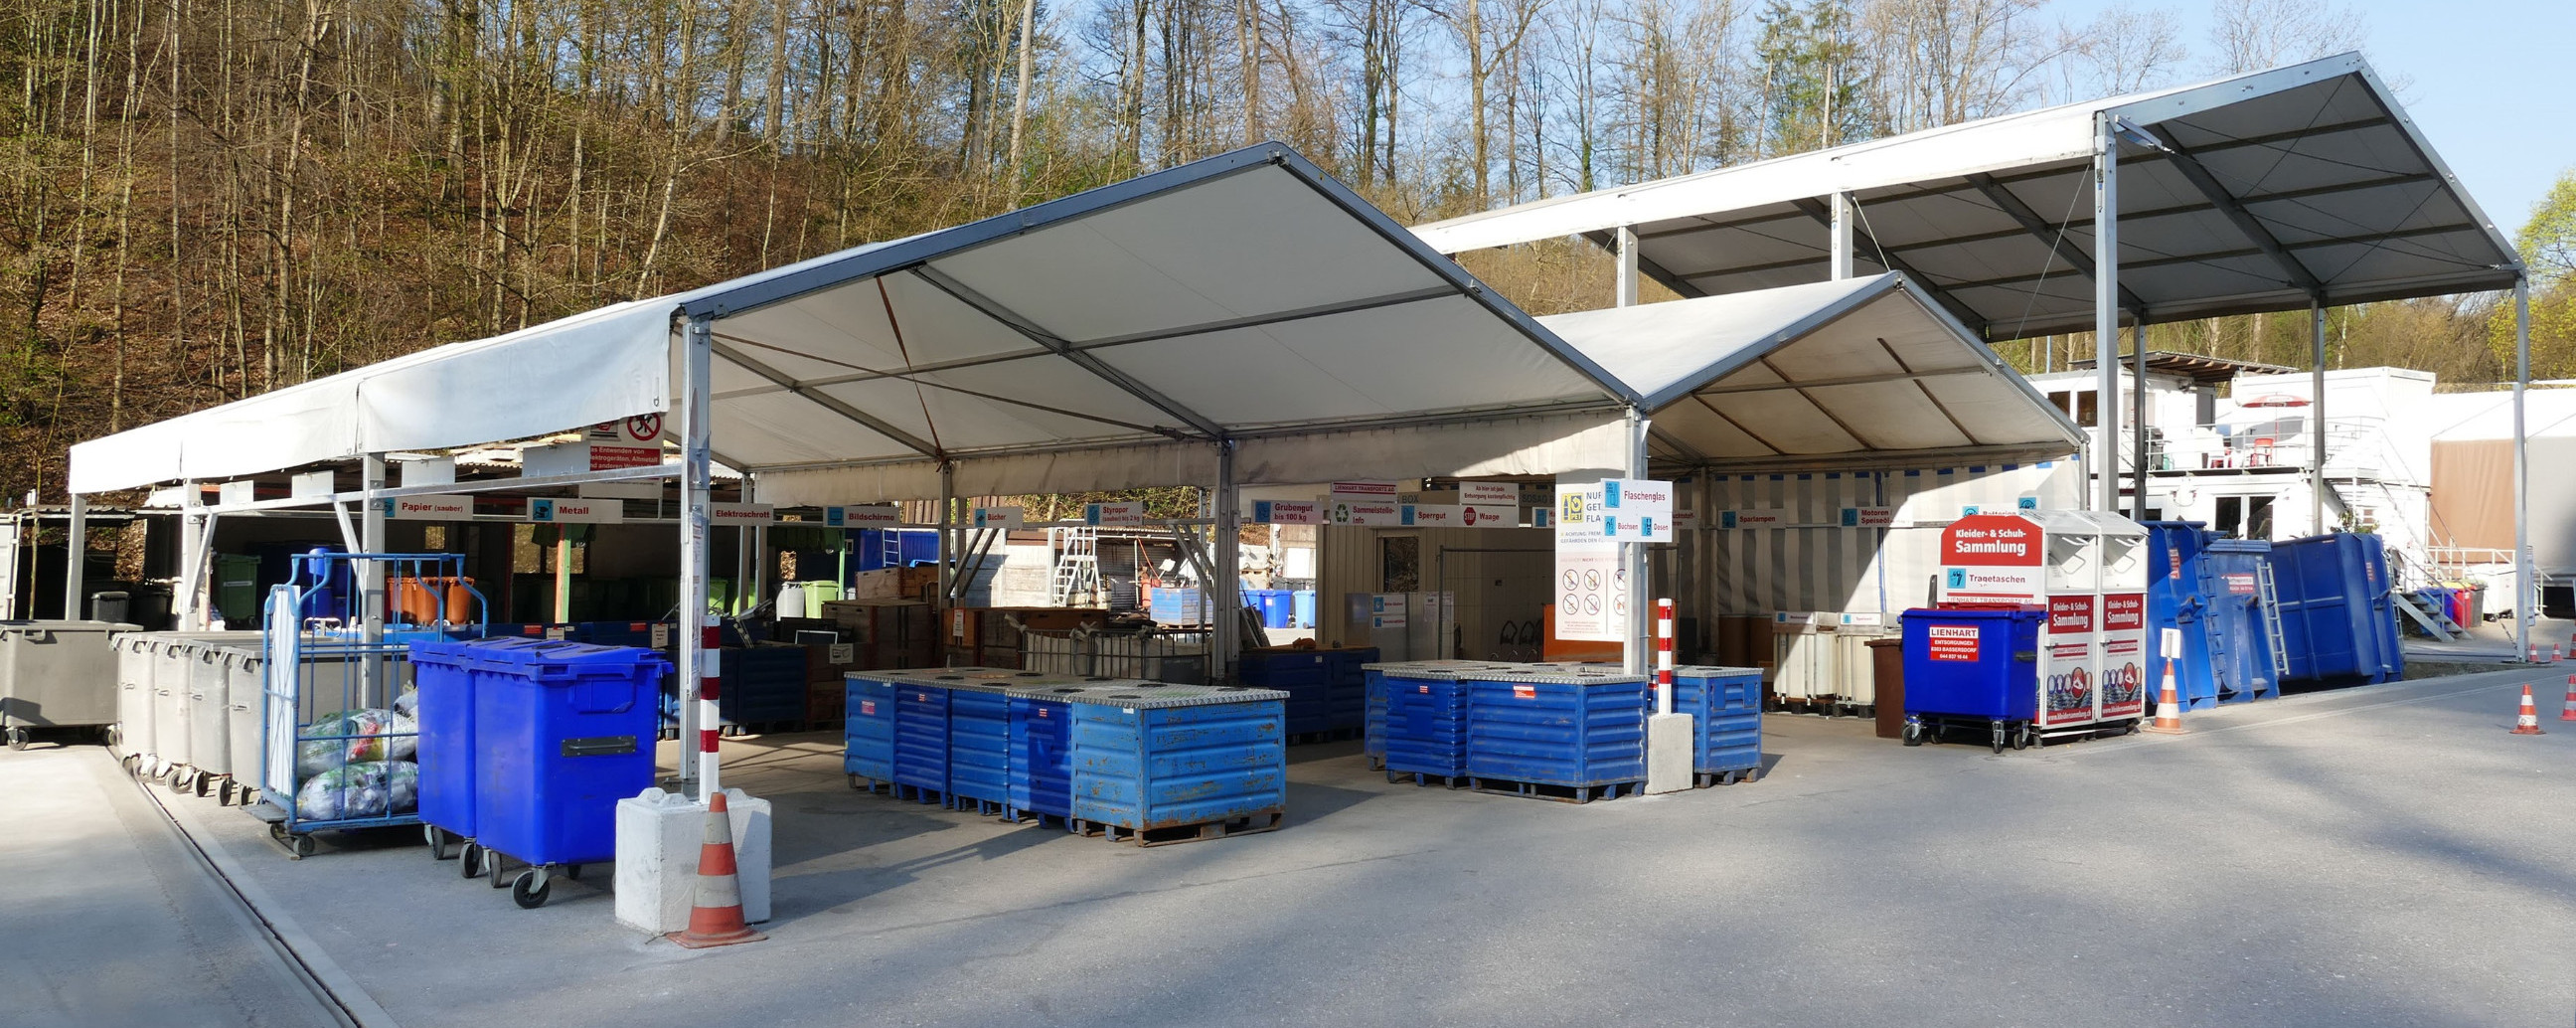 Entsorgungspark Bärwis Bassersdorf